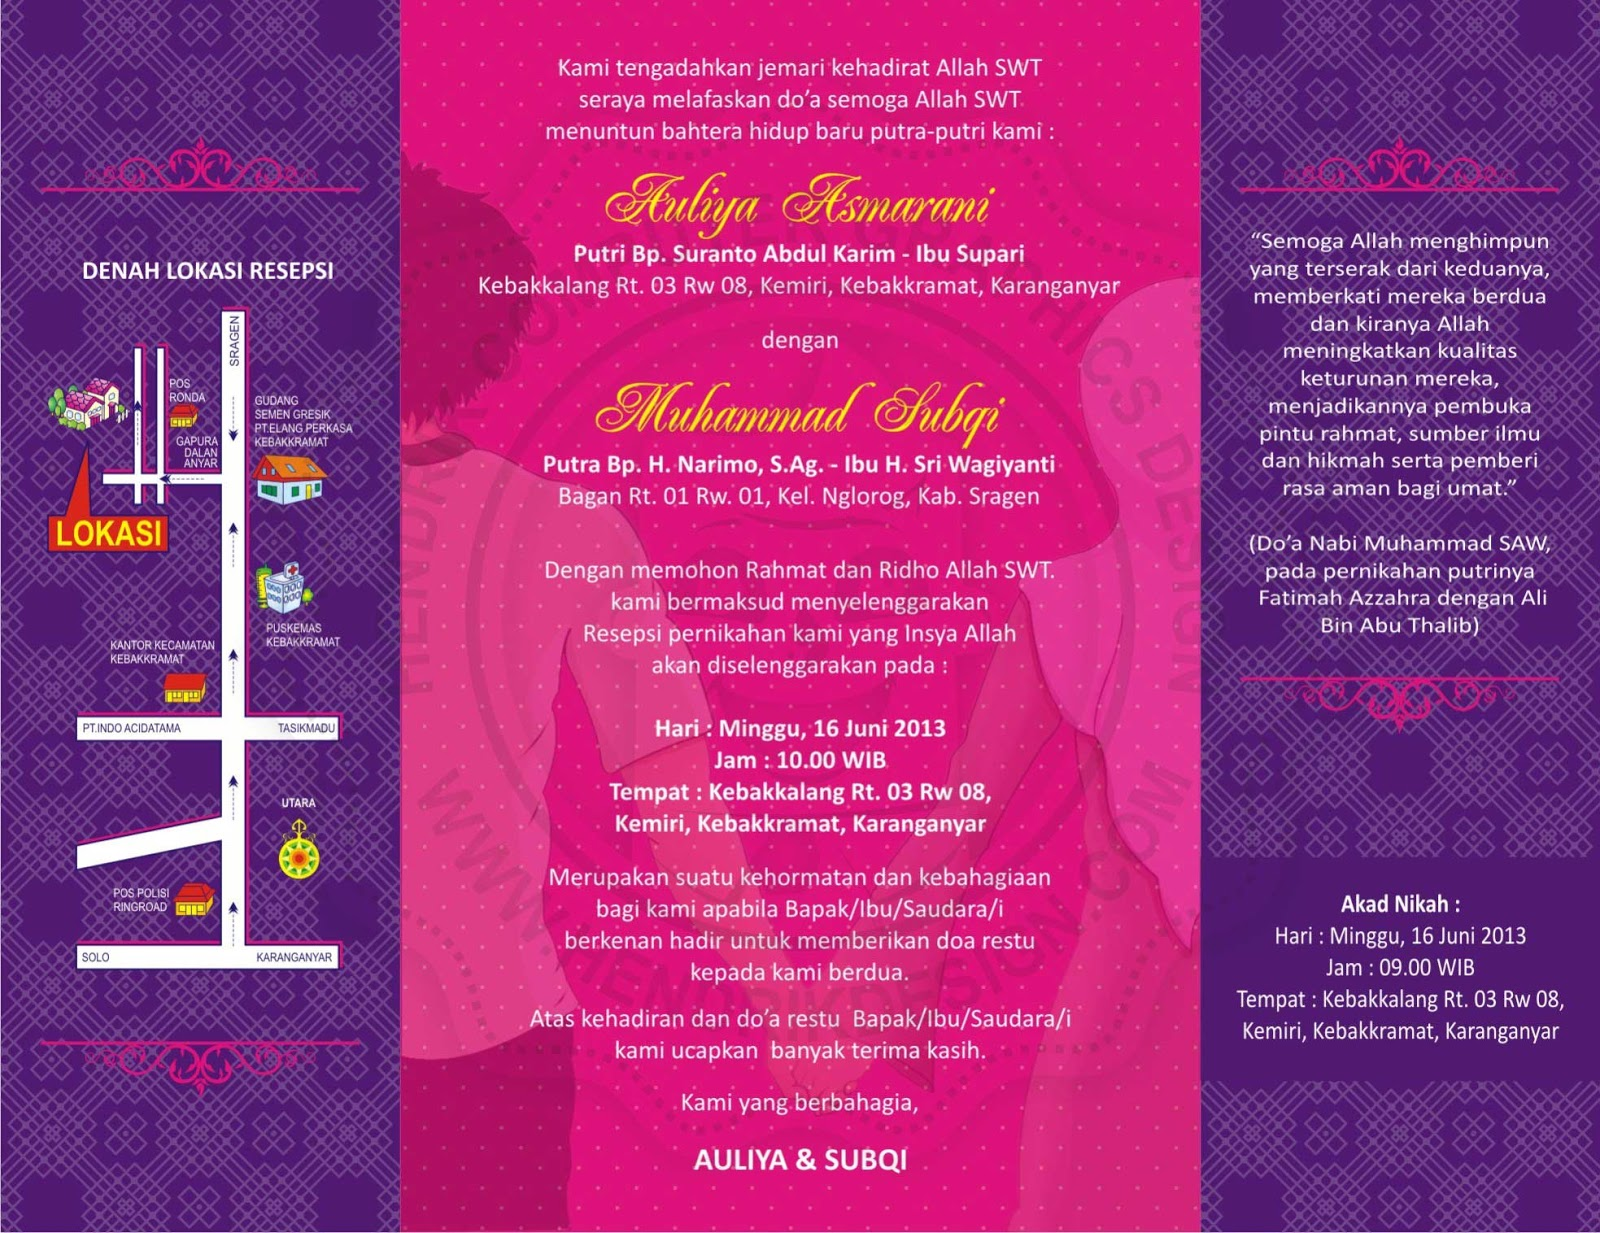 Model Desain Undangan Wedding Lucu Unik Terbaru Januari 2015